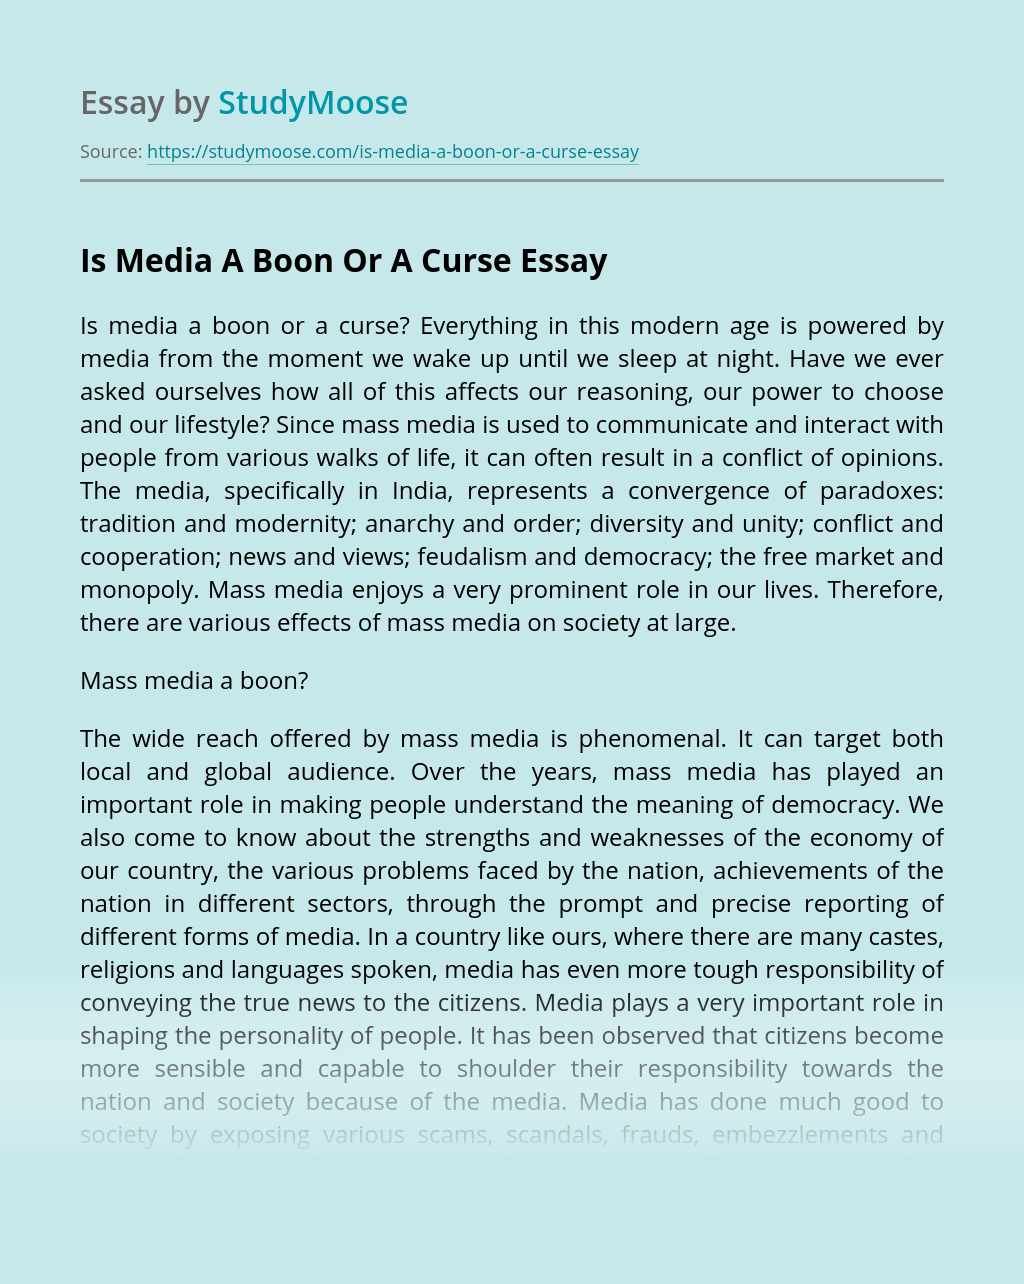 Is Media A Boon Or A Curse